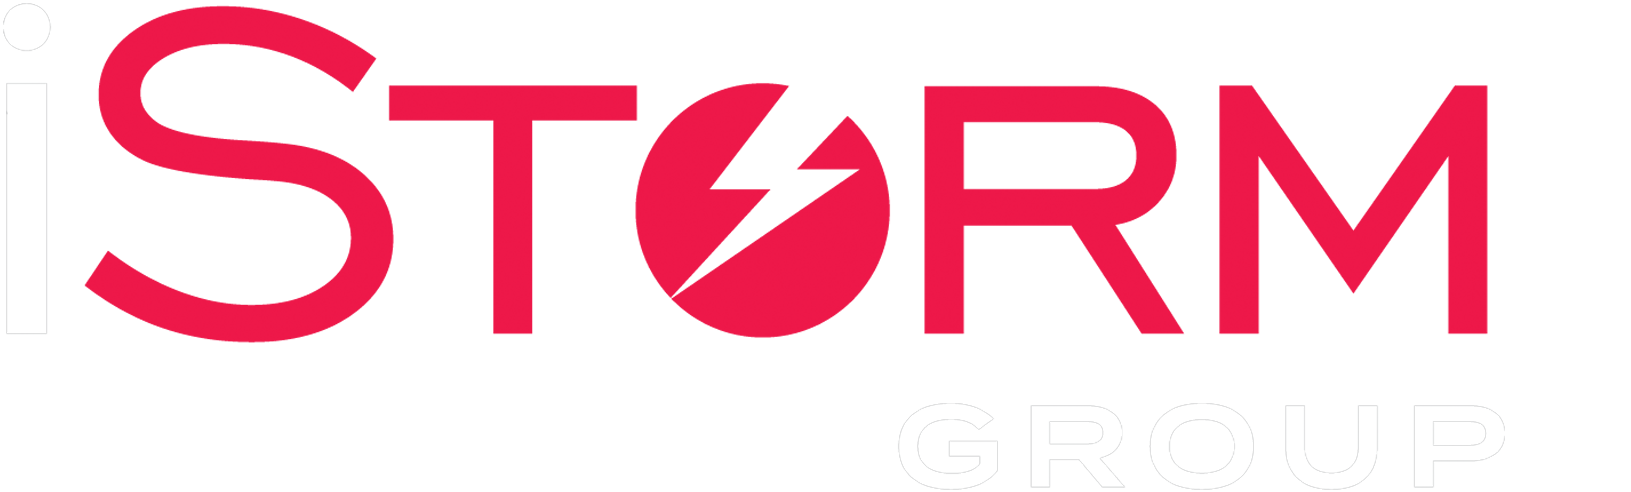 iStorm logo